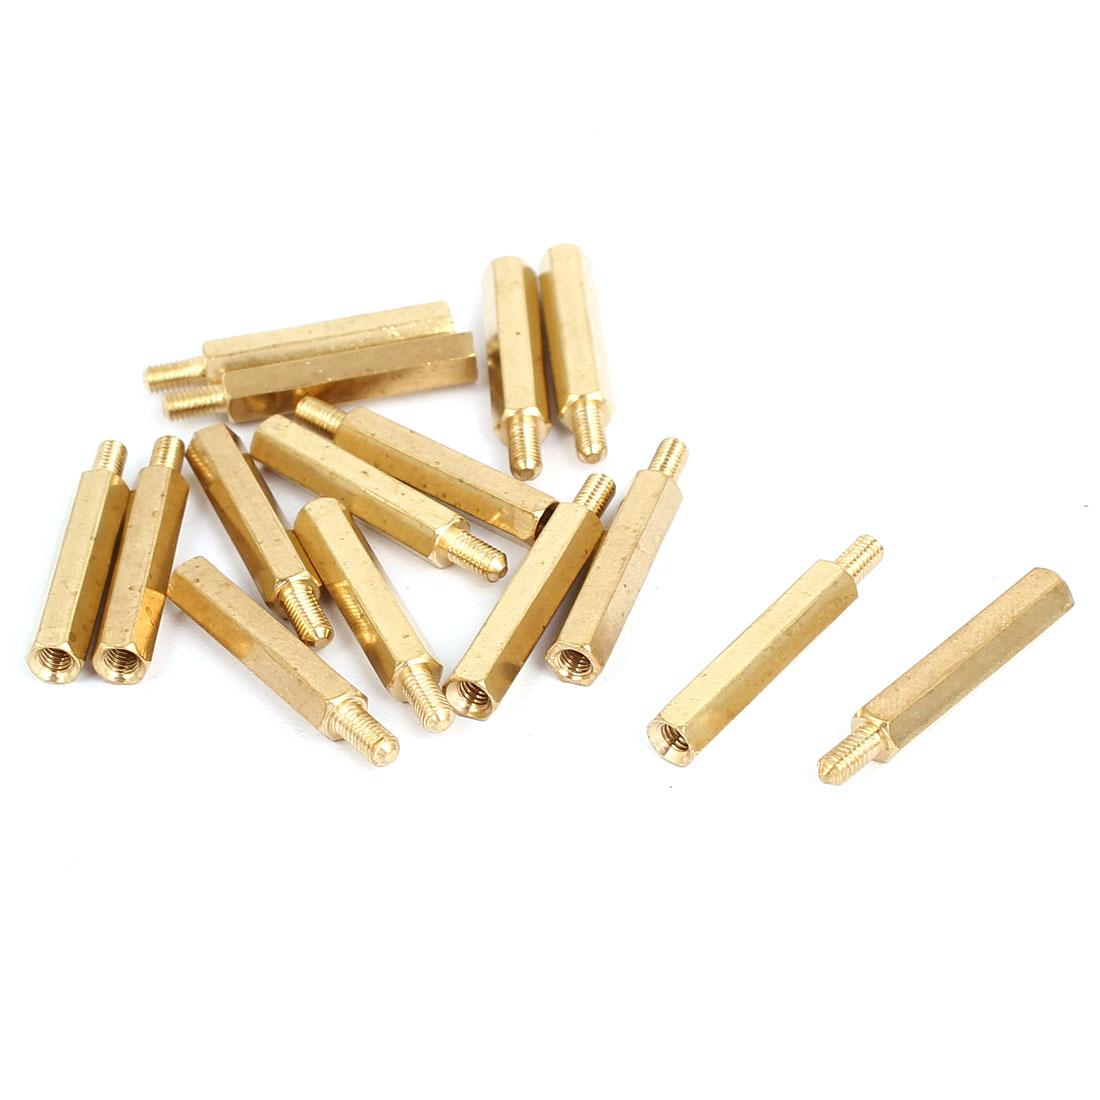 M3x23+6mm Male/Female Threaded Brass Hex Tapped Hexagonal Spacer Standoff Pillar 15pcs